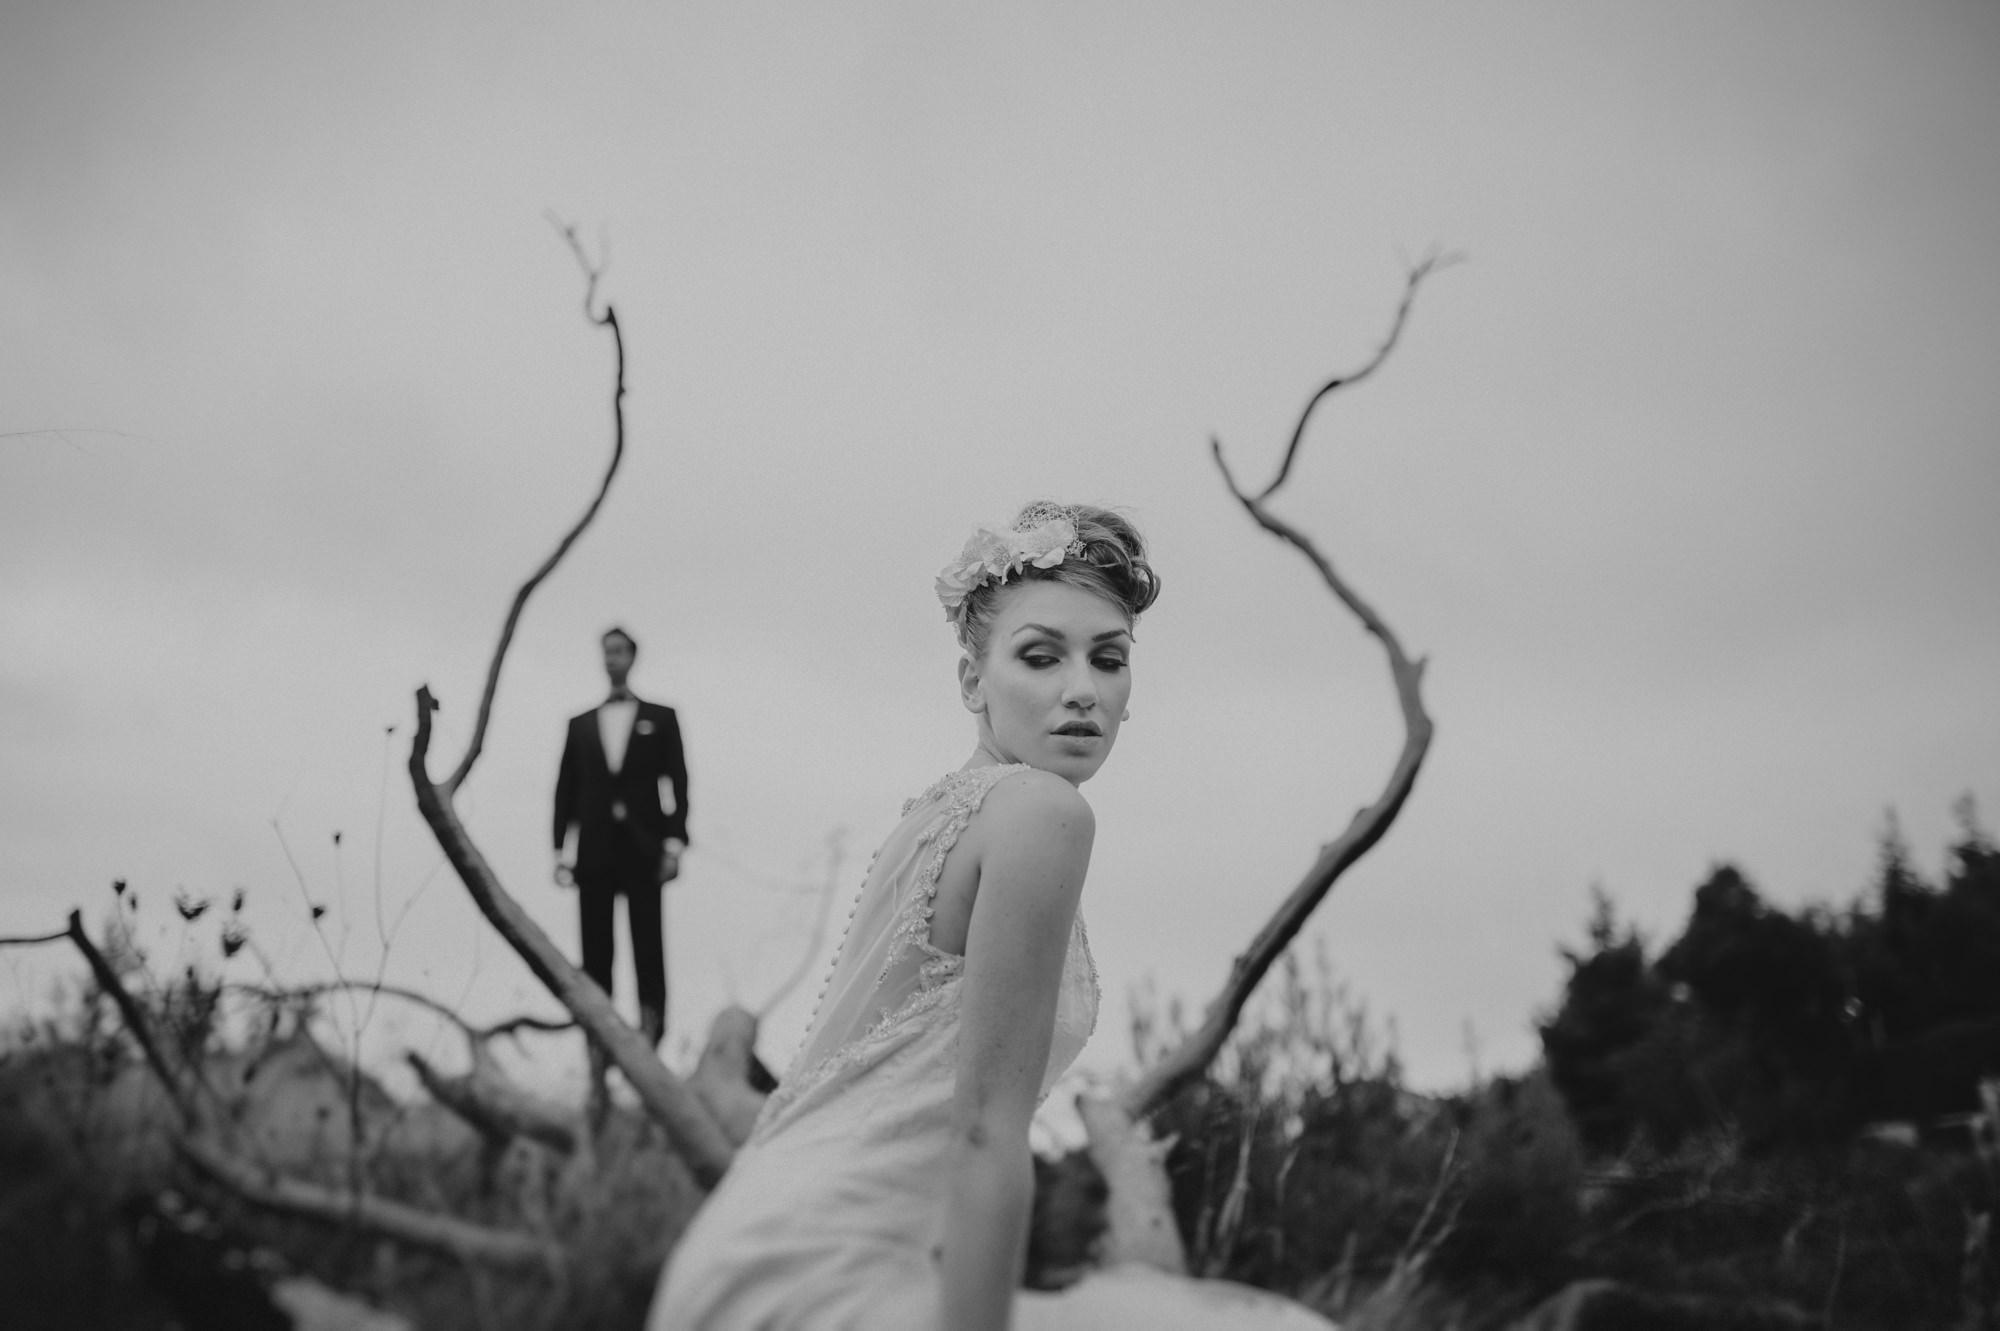 Artist black and white wedding portrait by Fer Juaristi